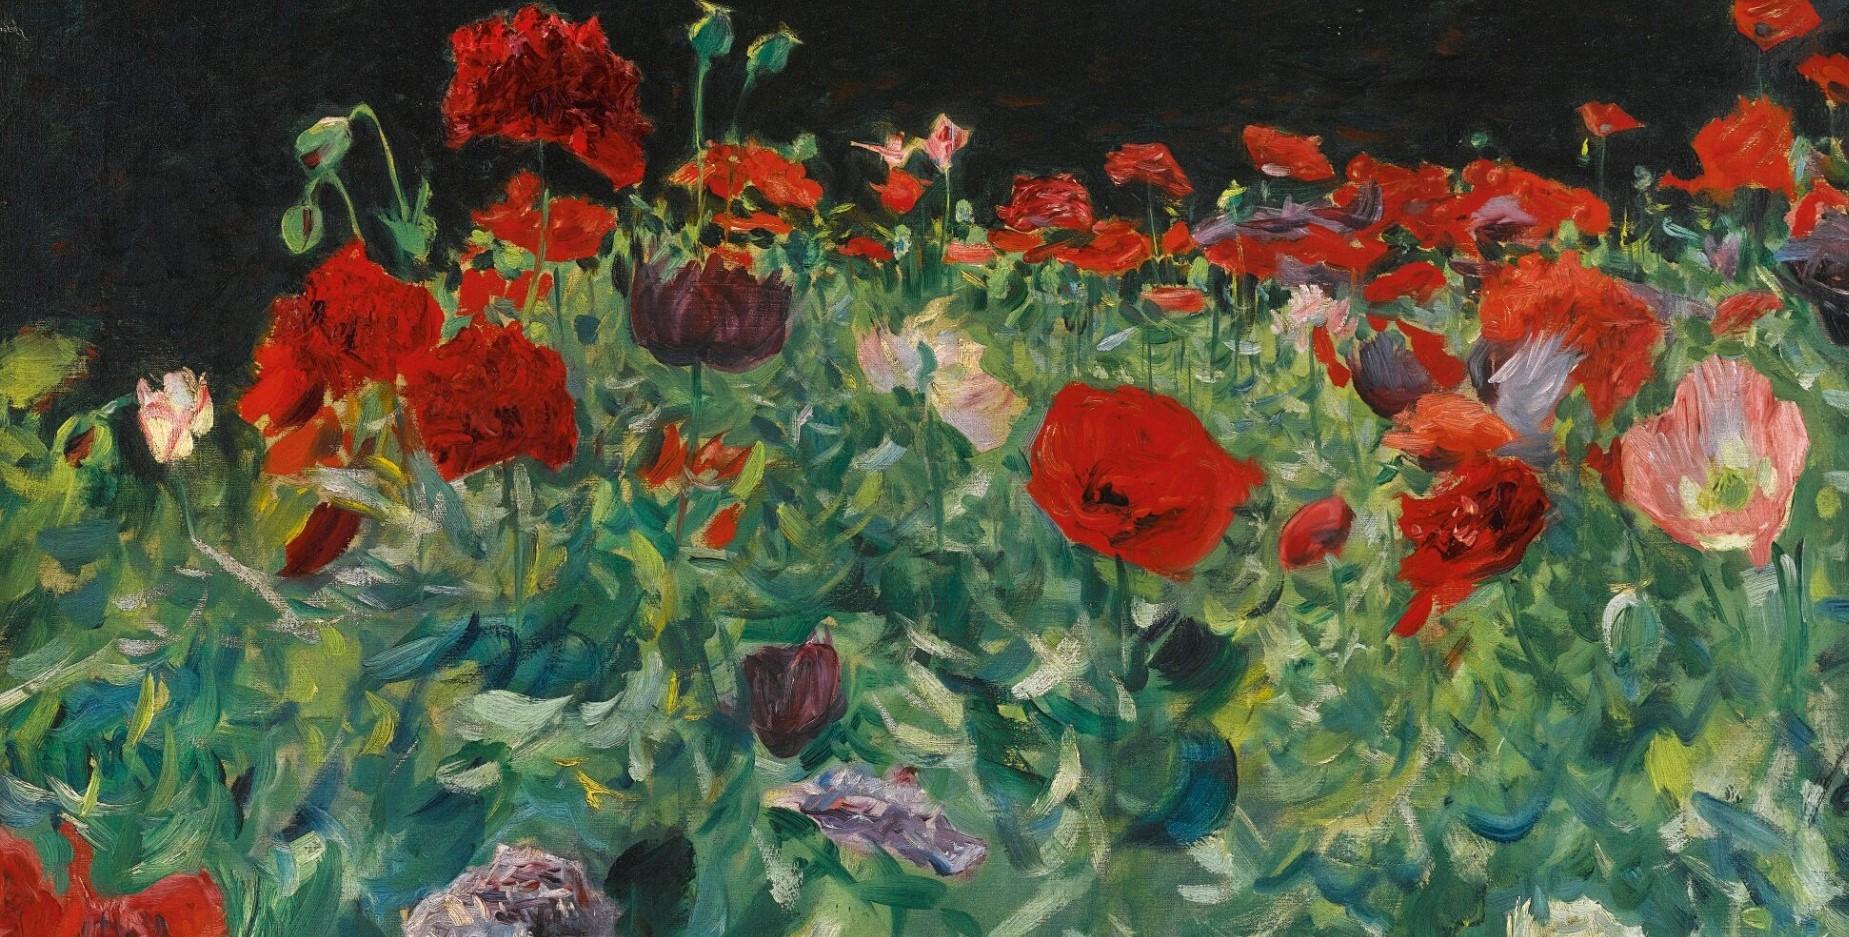 John Sargent poppies художник Сарджент картина маки пейзажи природы Альберт Сафиуллин